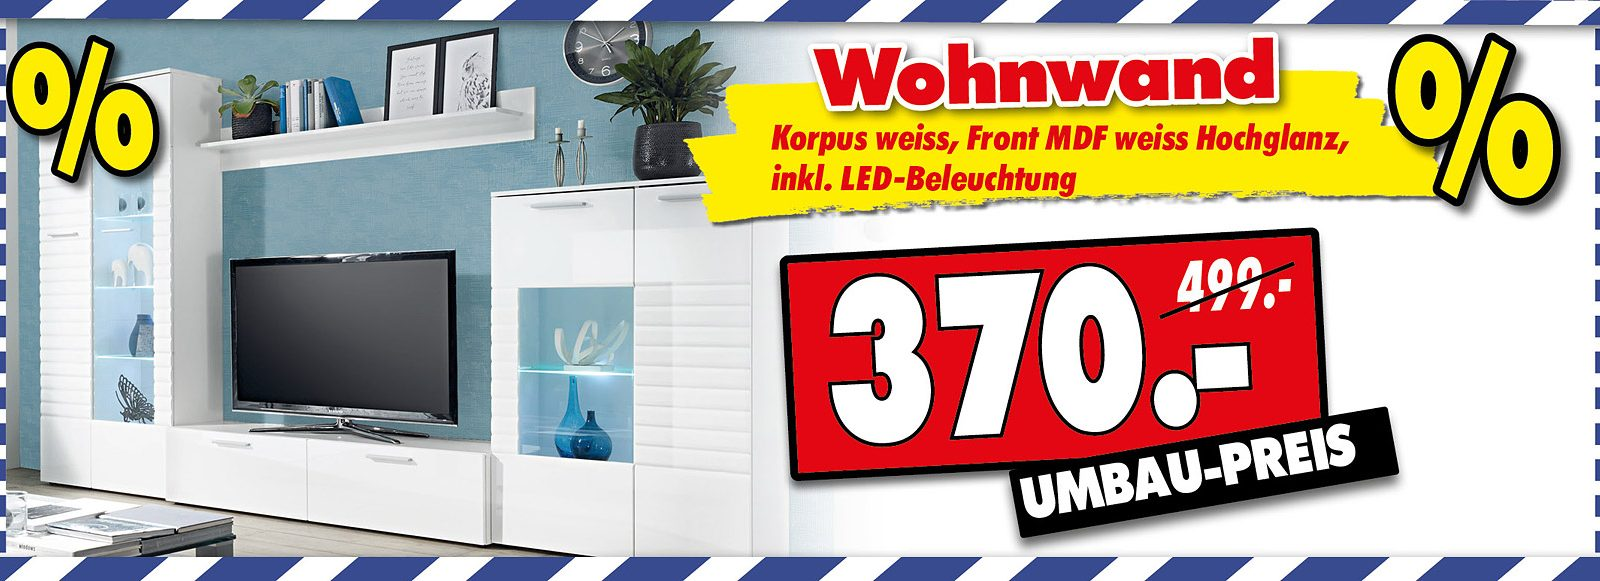 Satte Umbau-Rabatte bei Kranepuhls Optimale Möbelmärkte in Nuthetal!